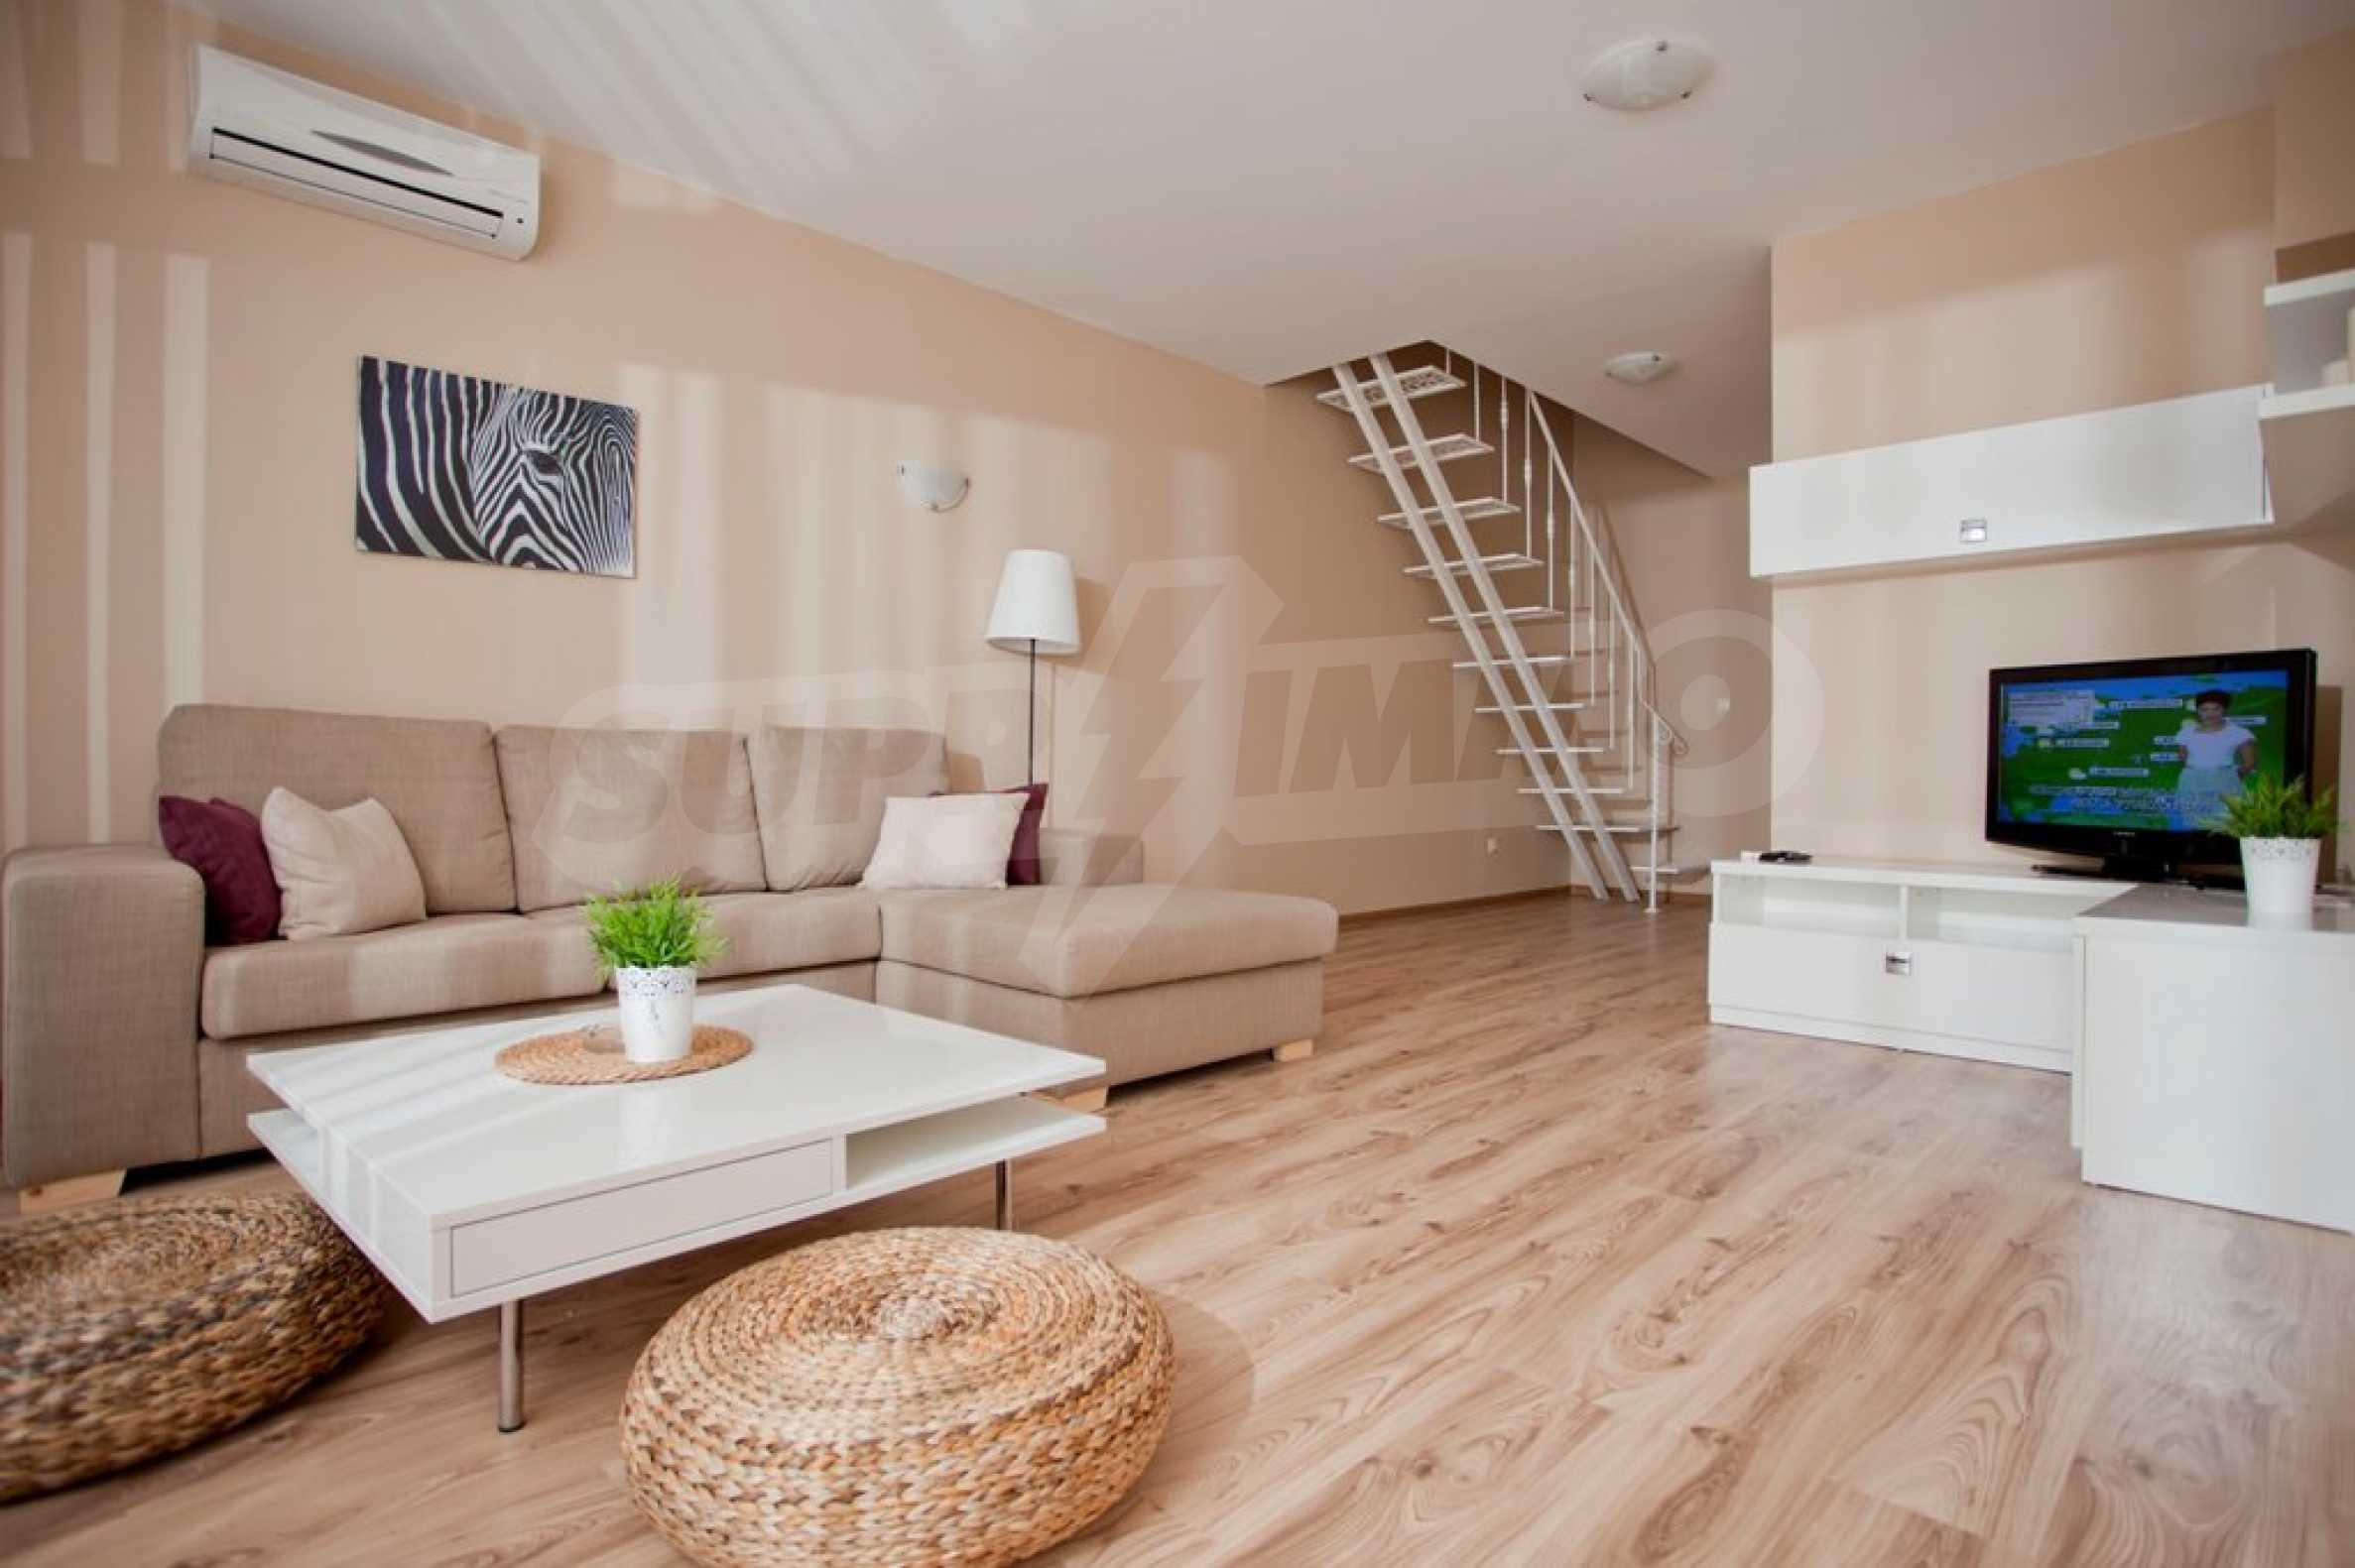 New apartment complex Atia resort in Chernomorets 19